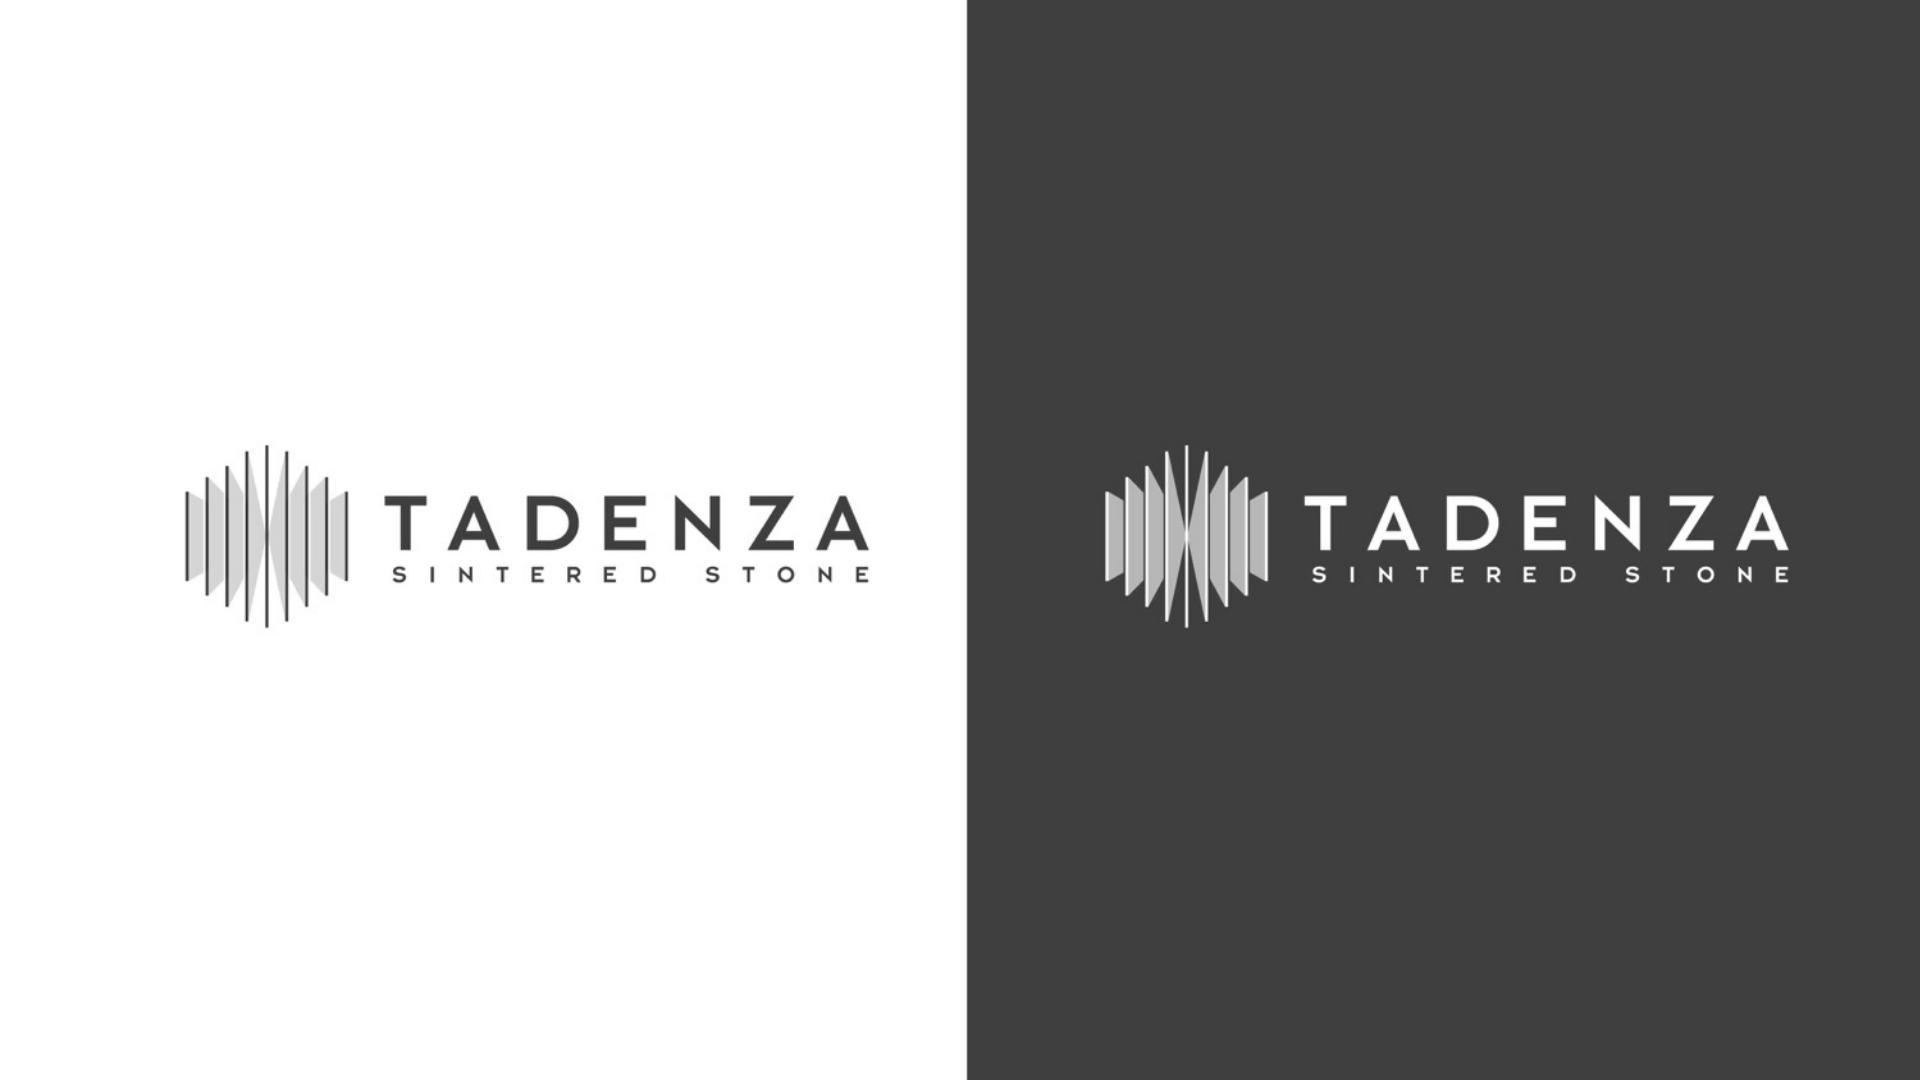 泰登沙TADENZA-案例欣赏